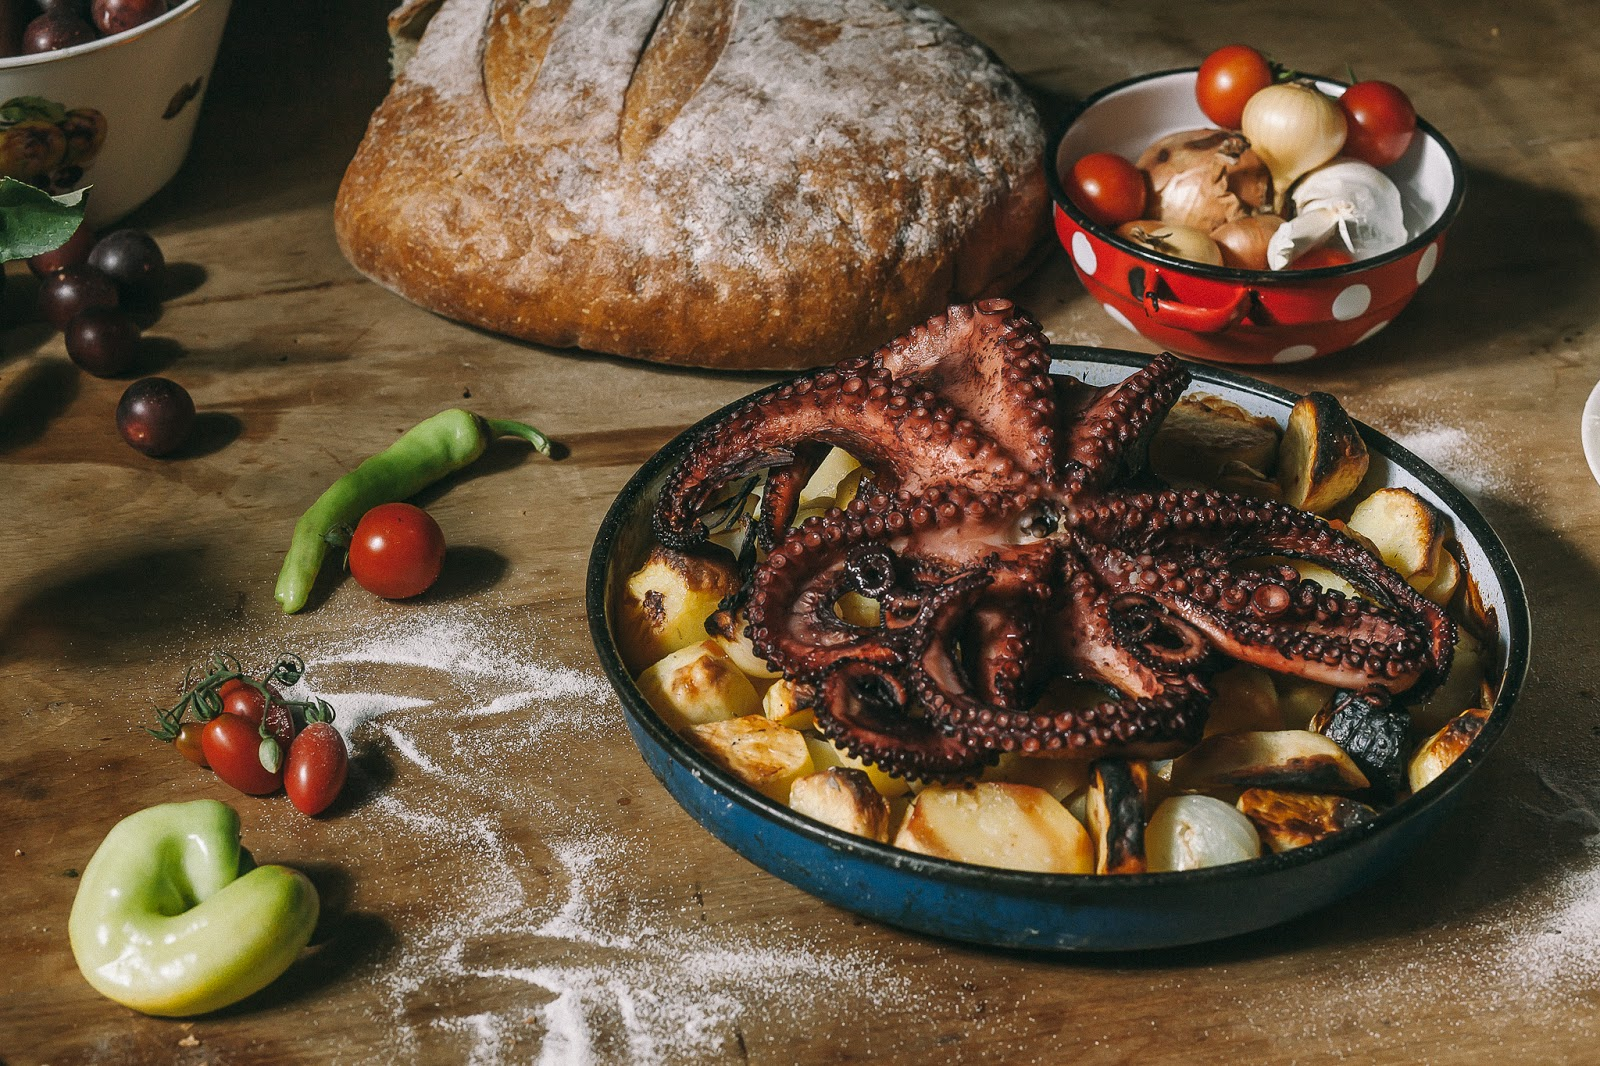 Hobotnica na srpski način